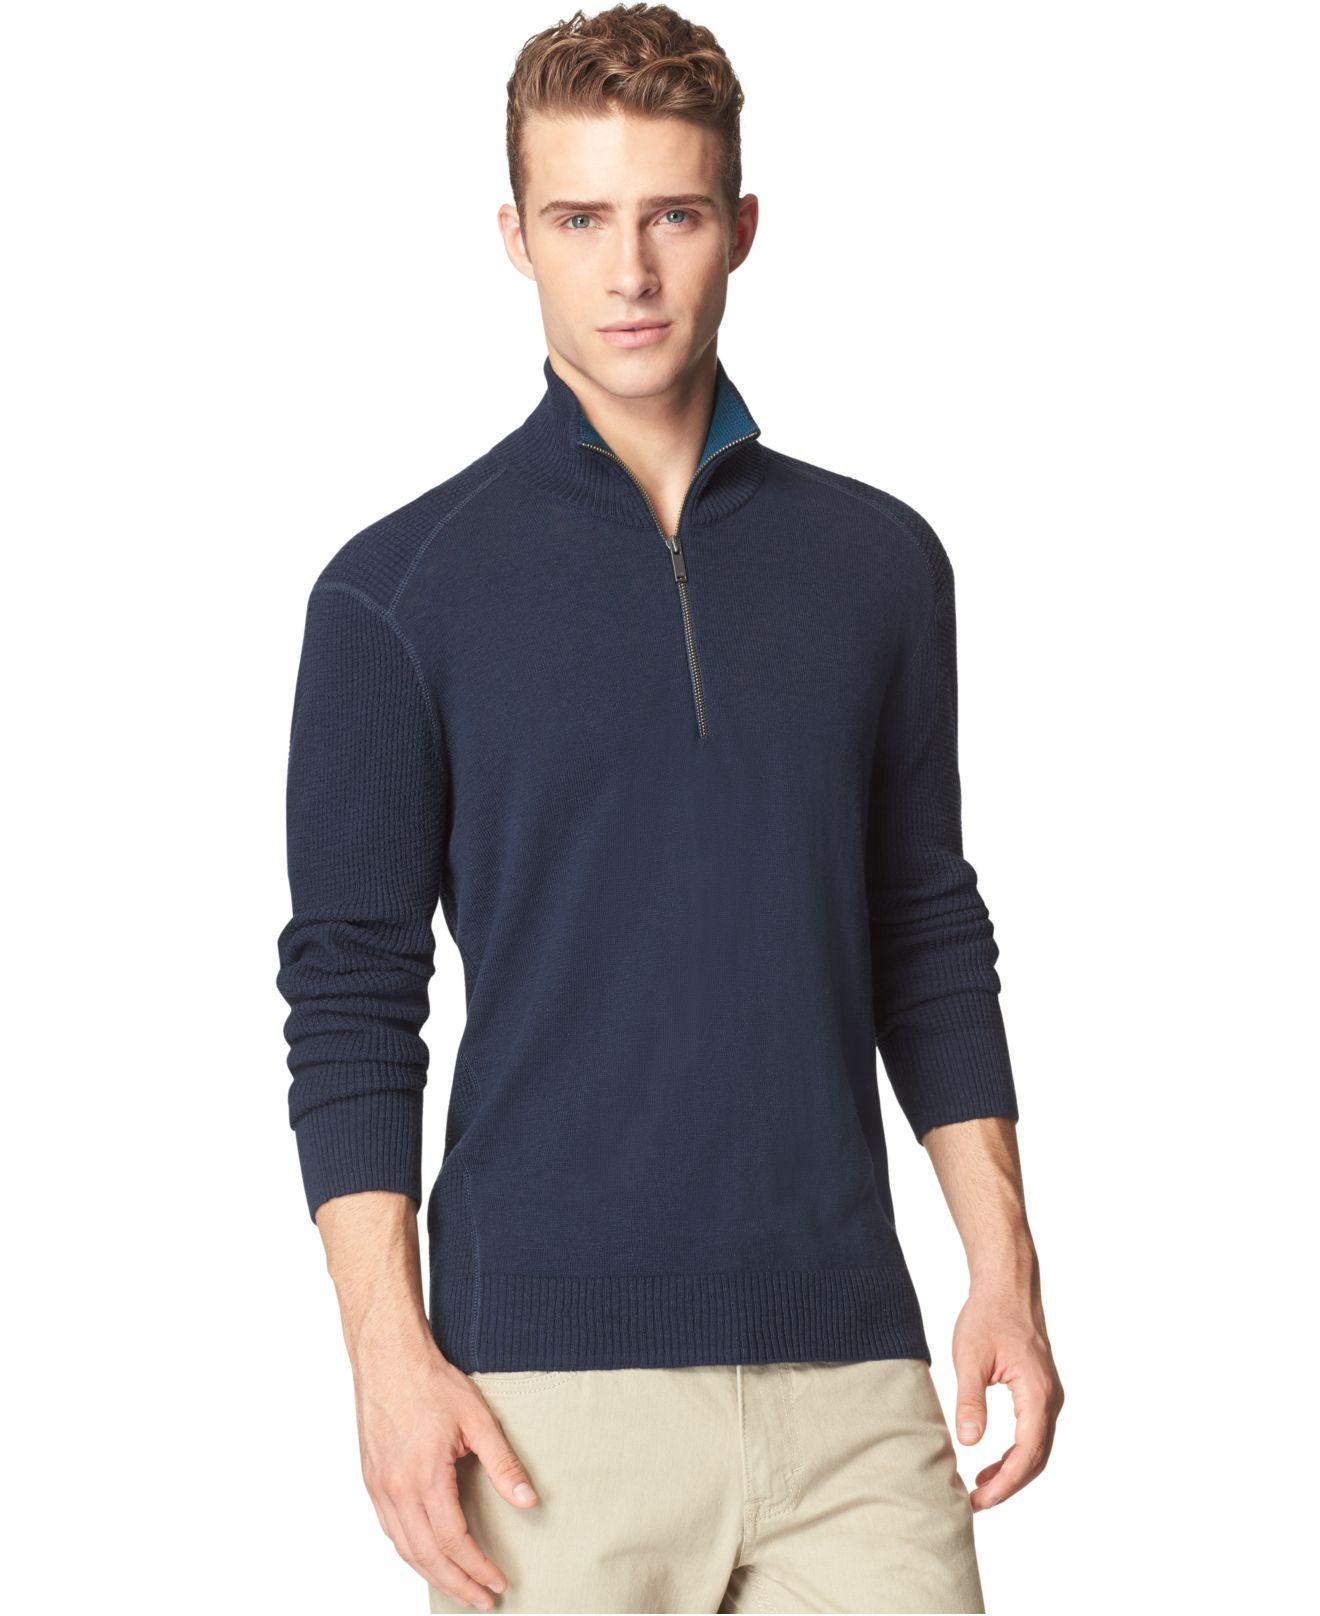 calvin klein jeans textured zip sweater in blue for men. Black Bedroom Furniture Sets. Home Design Ideas